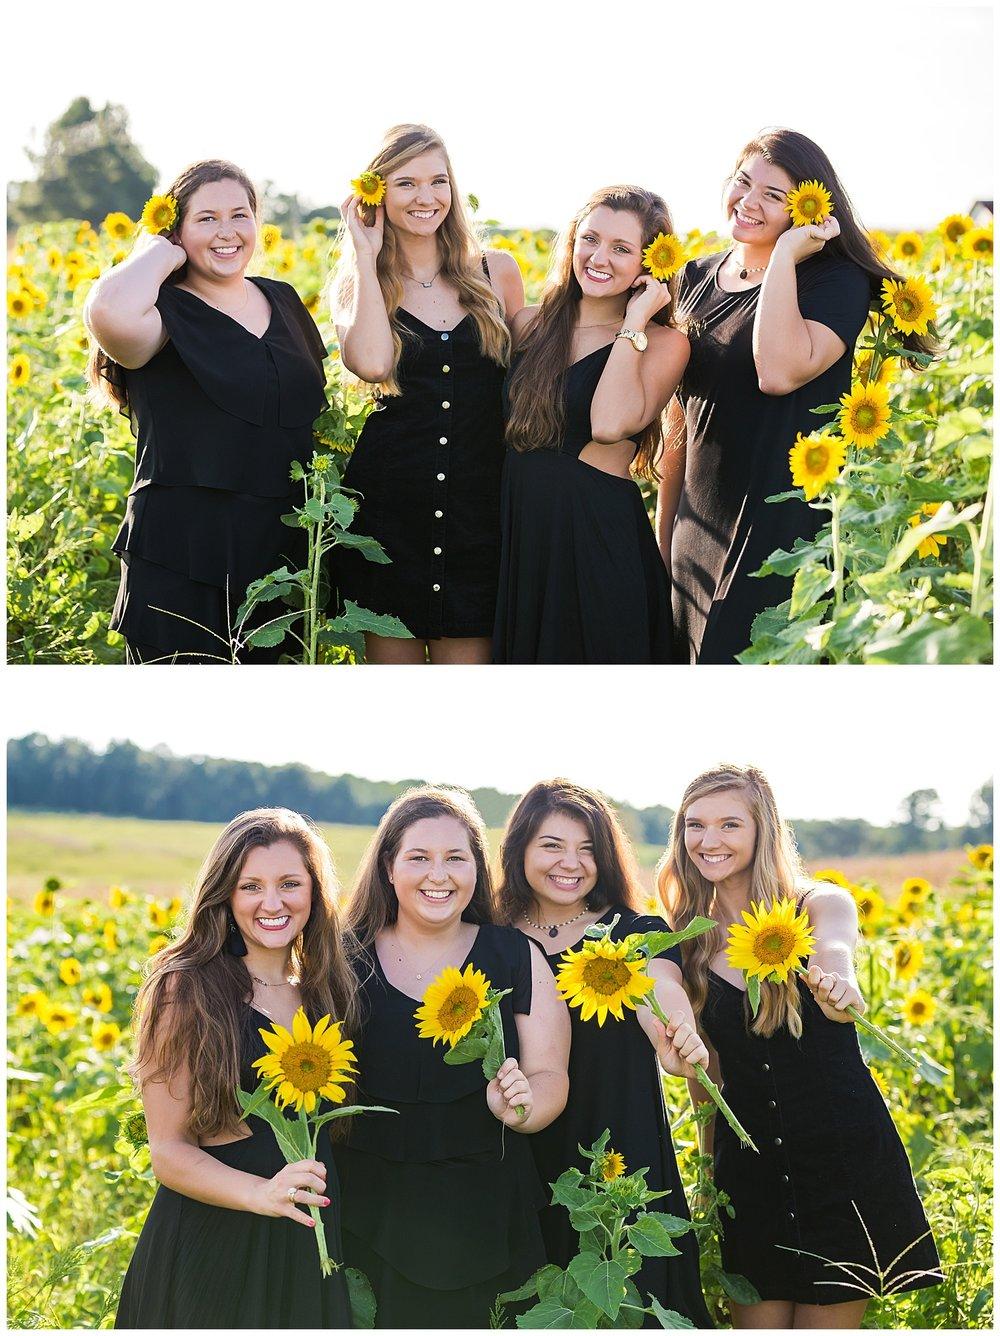 sunflower group photo session senior portraits lbeesleyphoto